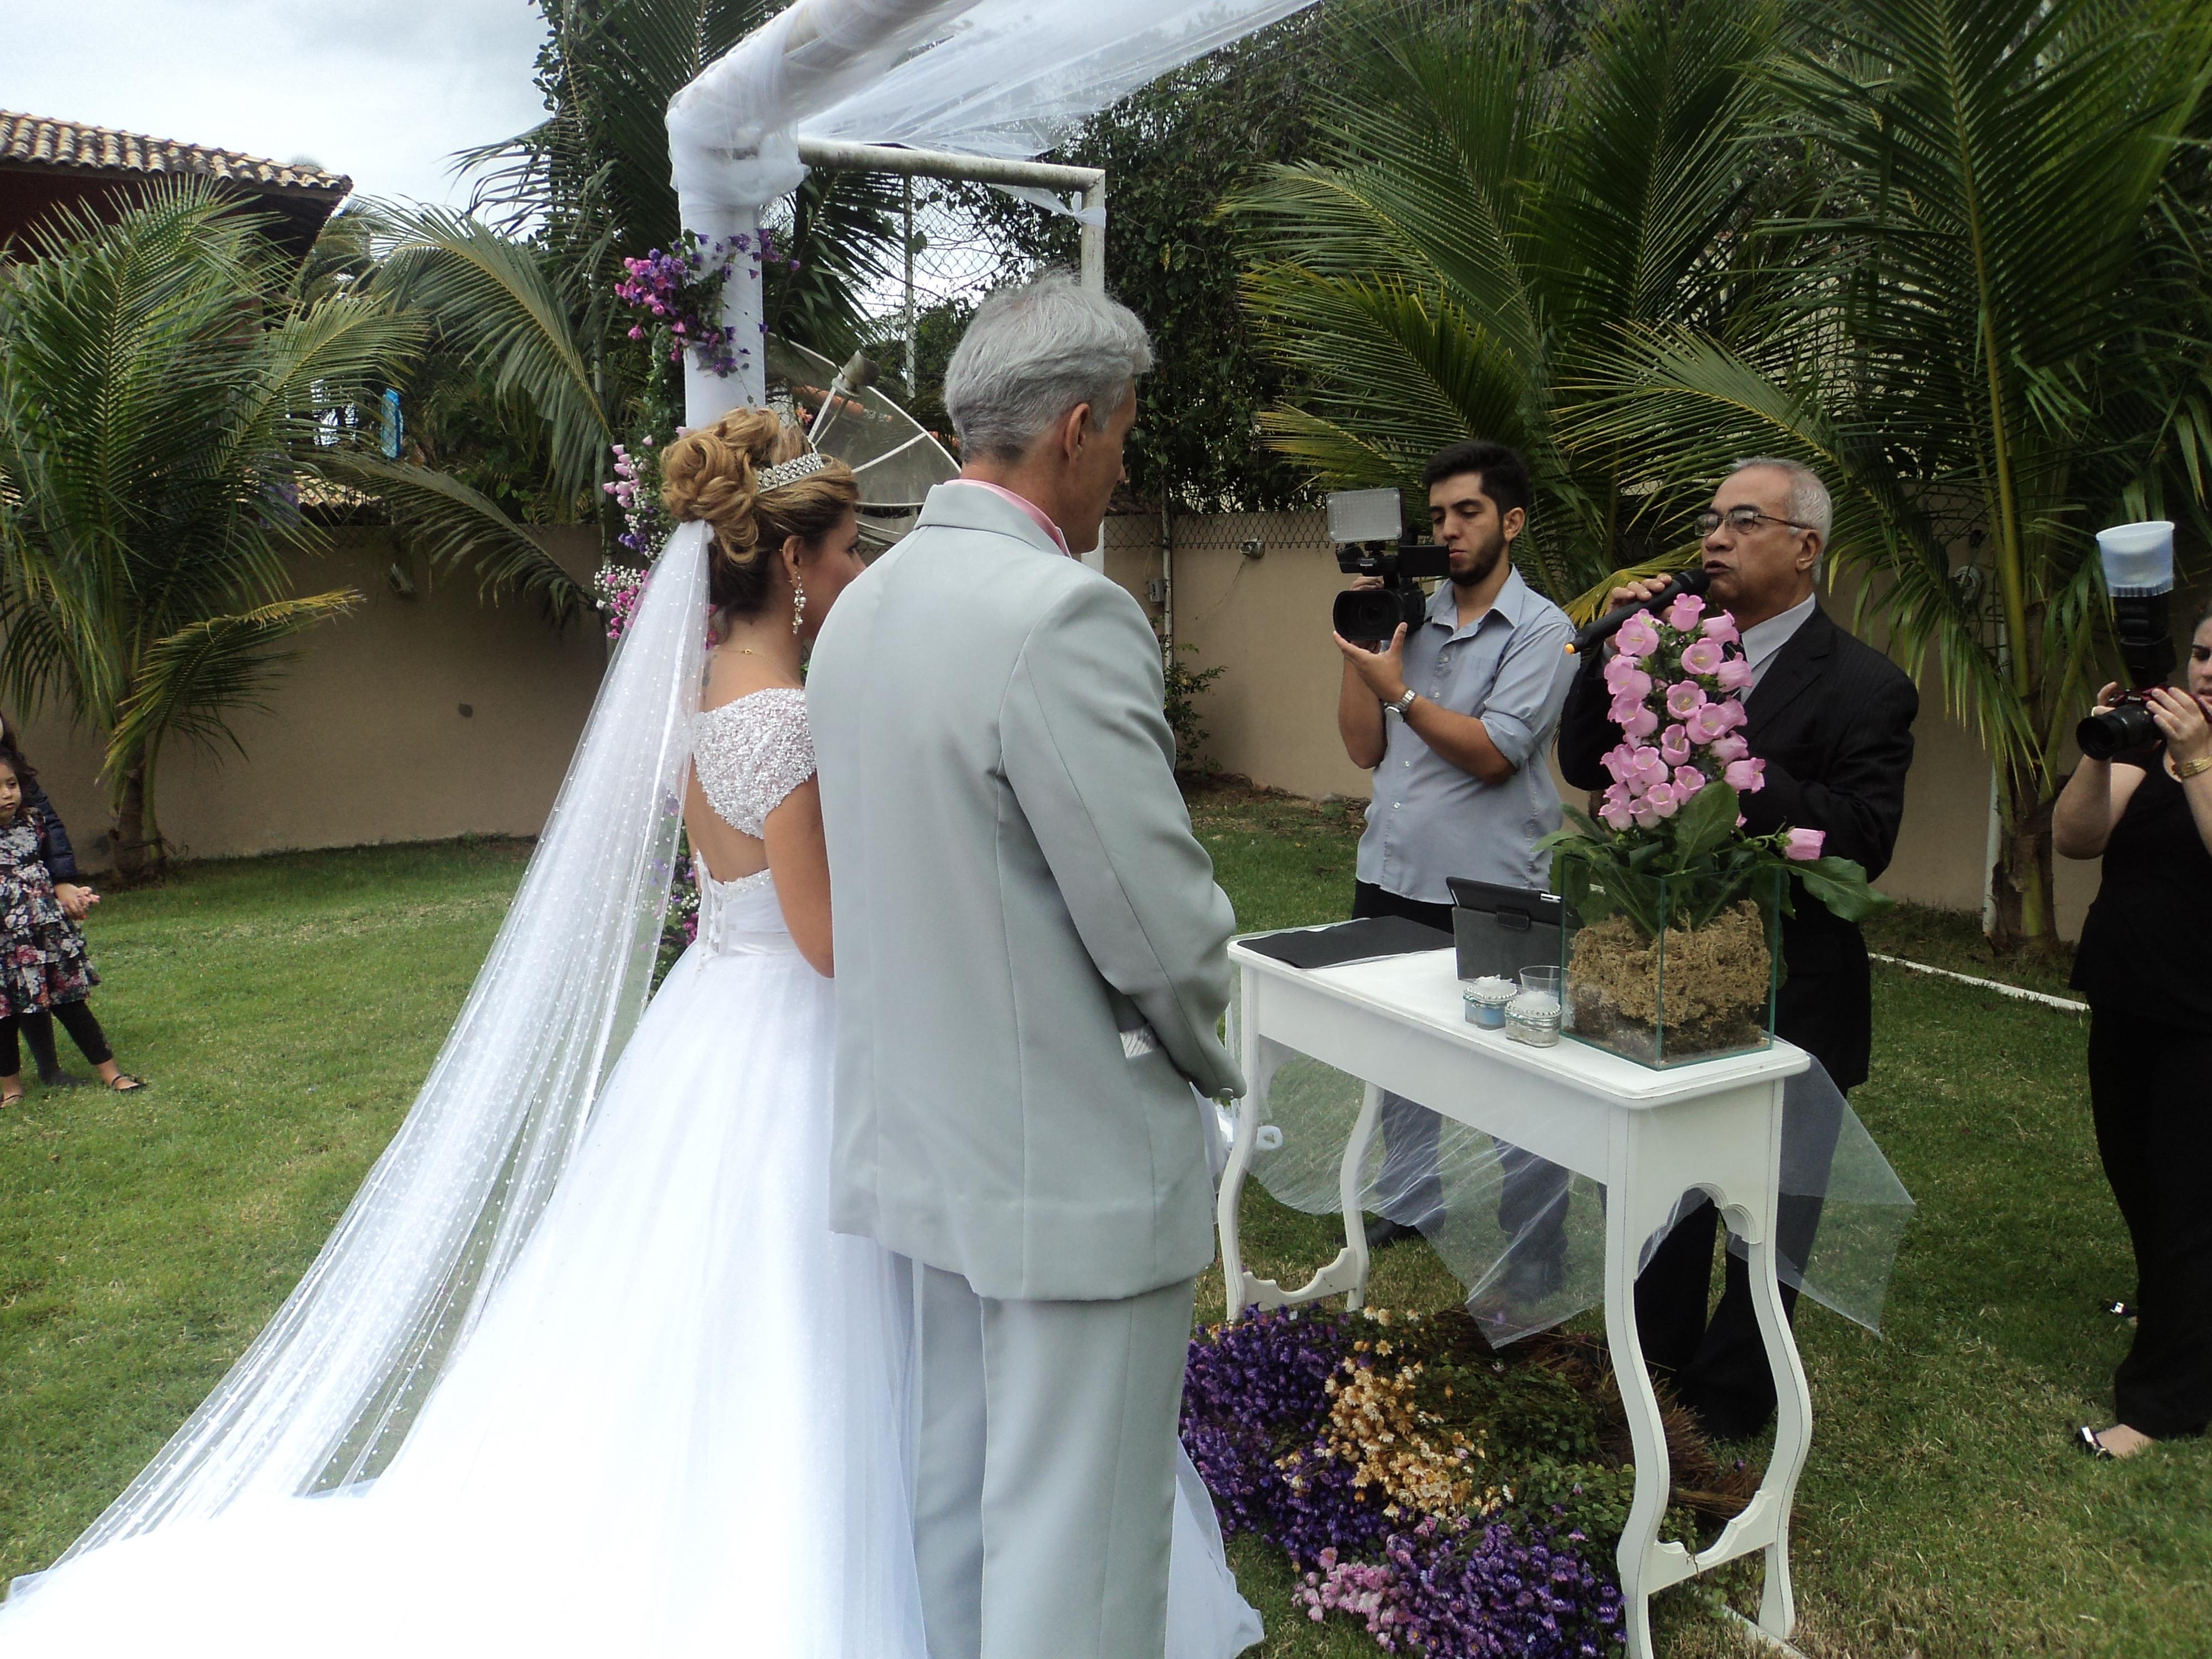 foto momento 4 da cerimônia de casamento Marcio e Danielle, 19.7.14, sitio Itaipuaçu.